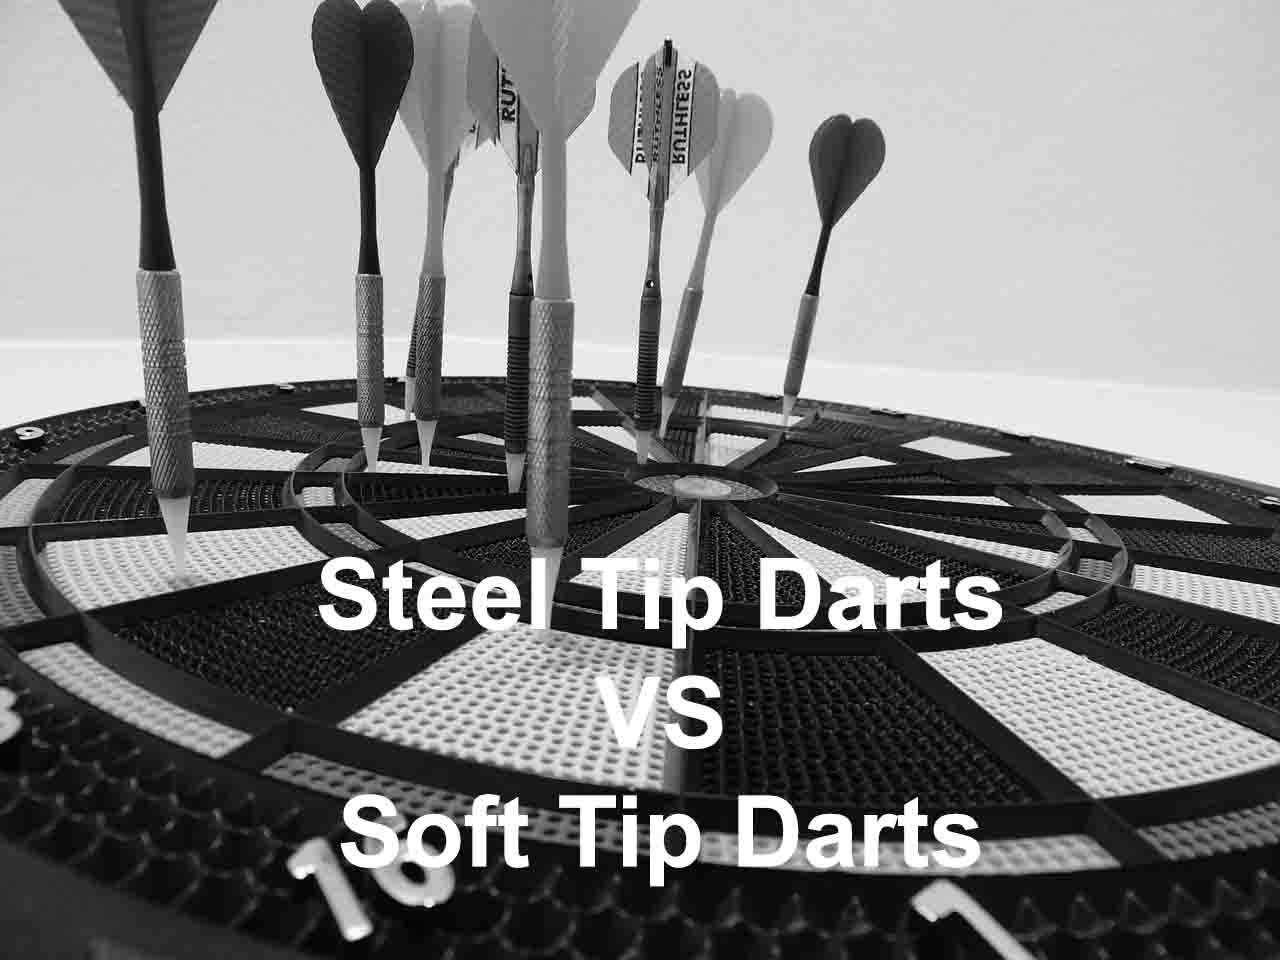 Types of Darts